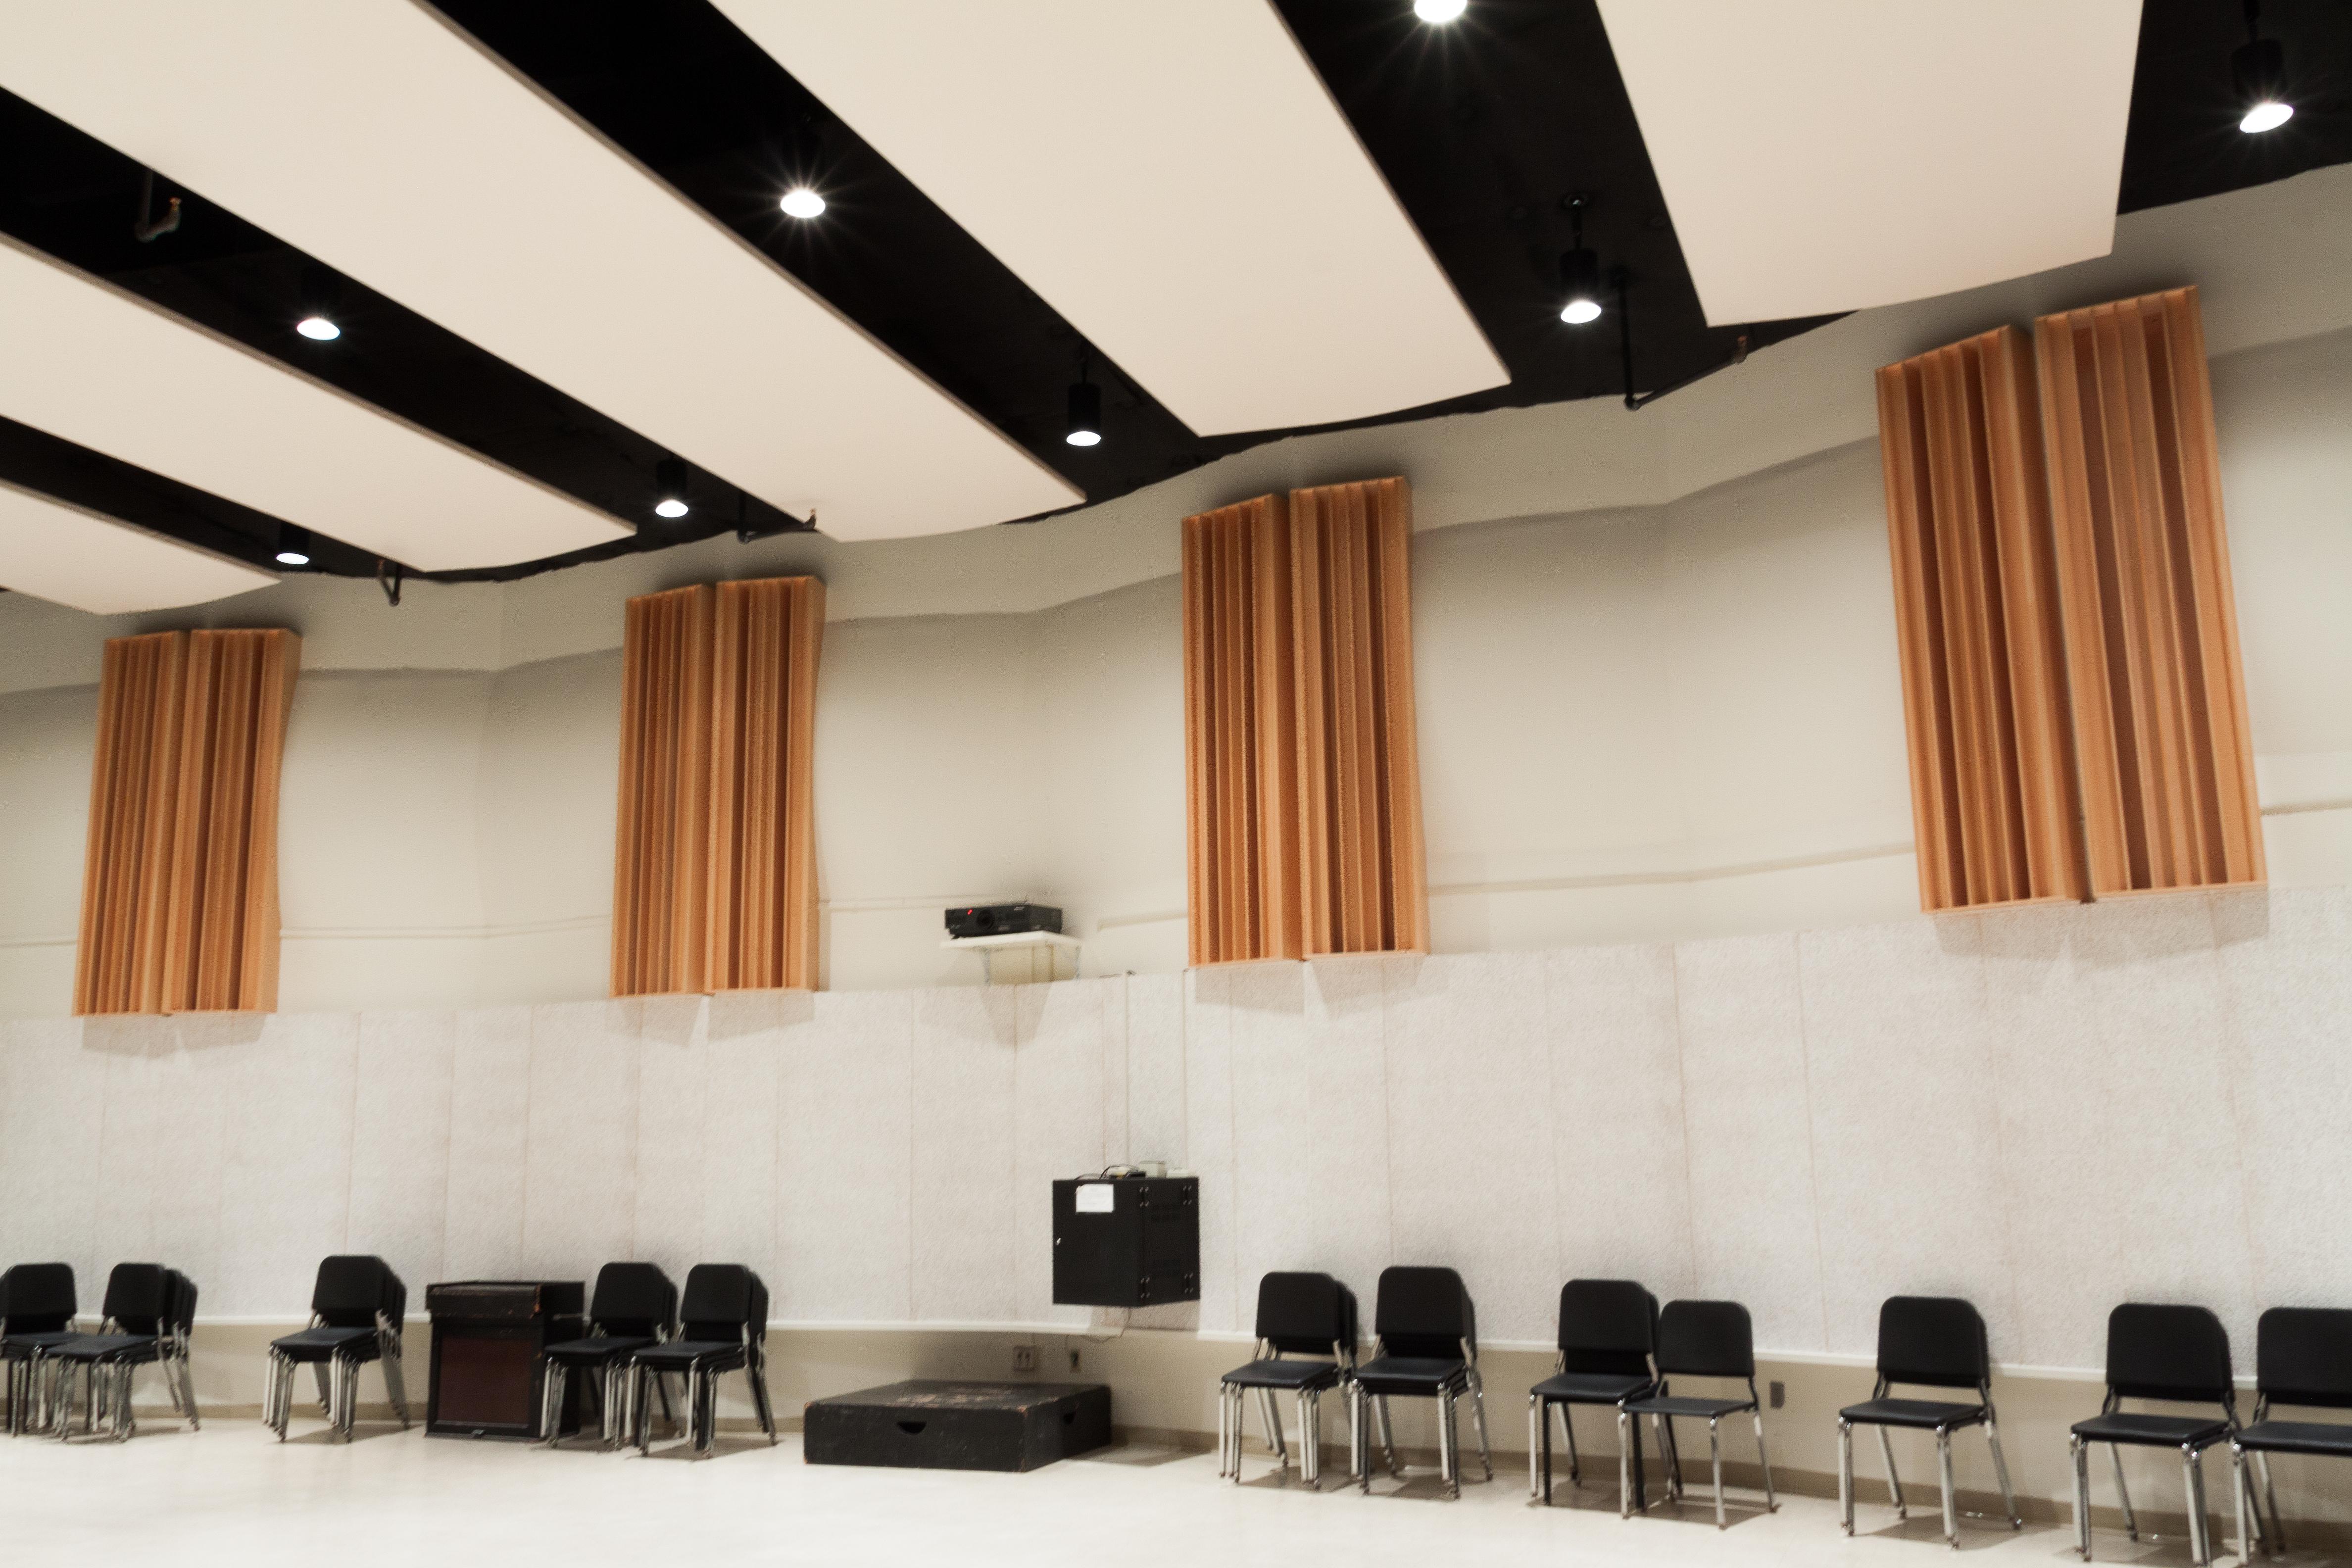 WVU CAC Rehearsal Hall 9-7-13-3